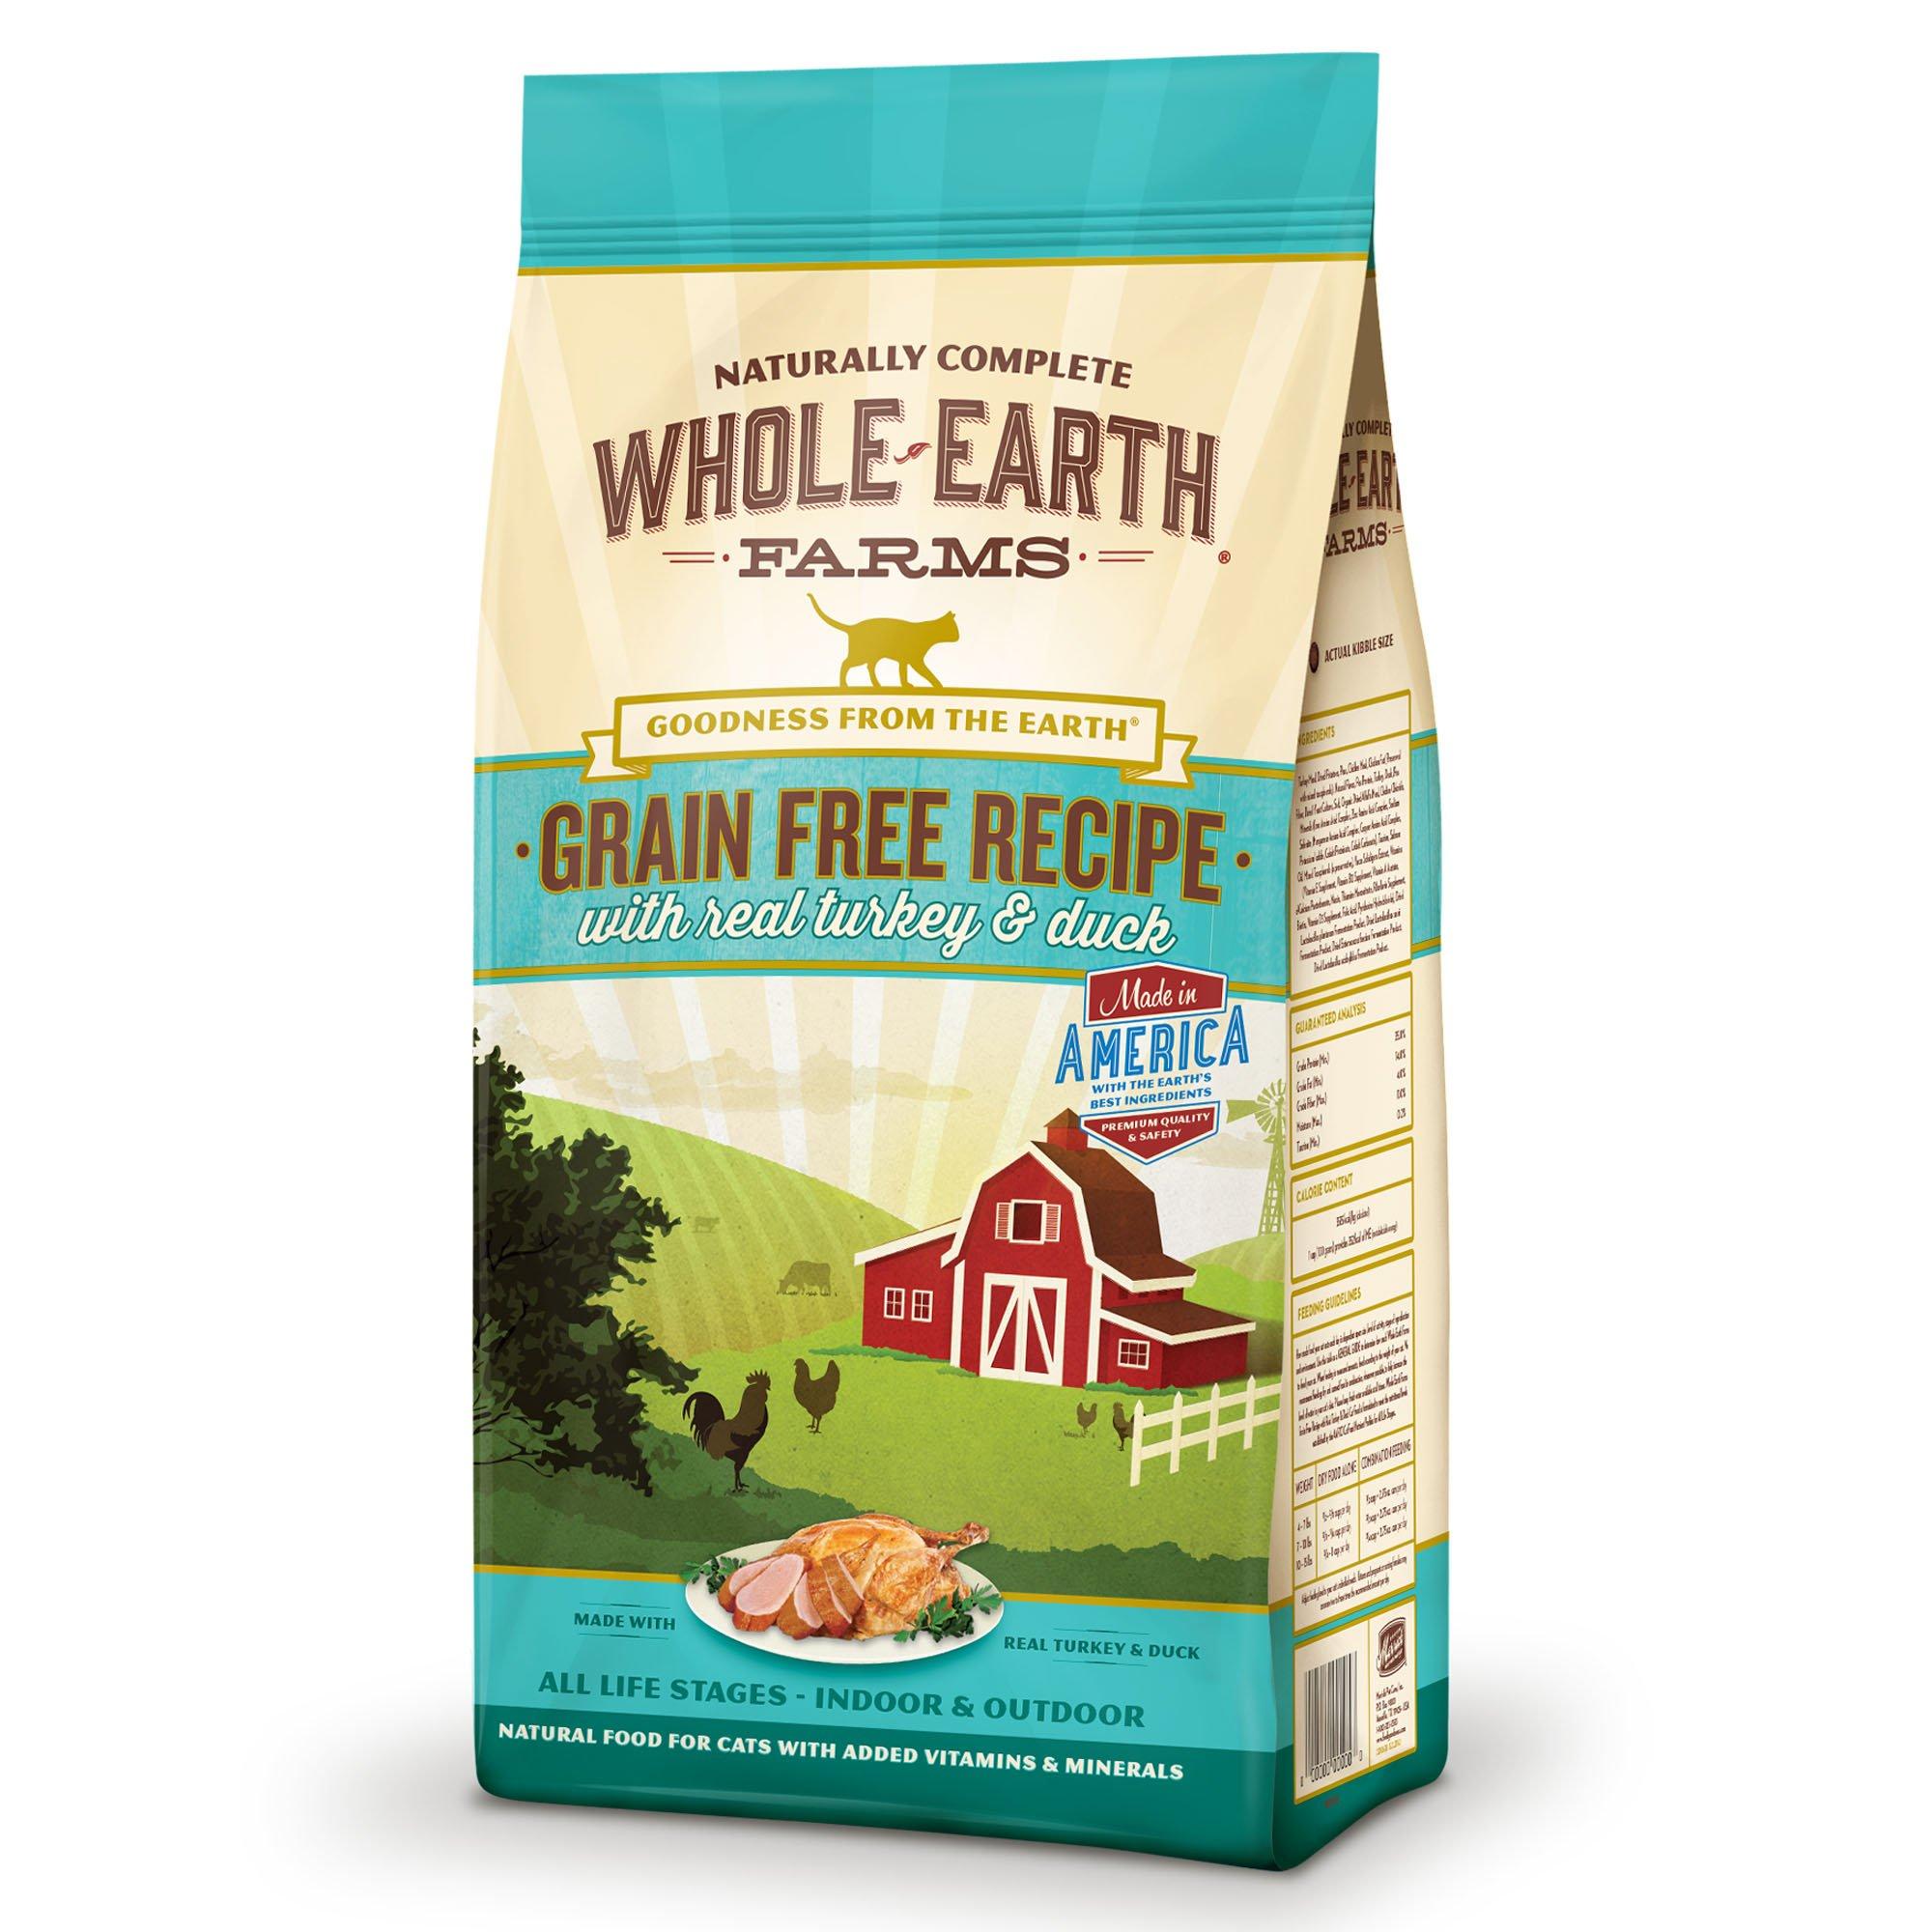 Whole-Earth-Farms-Grain-Free-Real-Turkey-amp-Duck-Cat-Food thumbnail 8